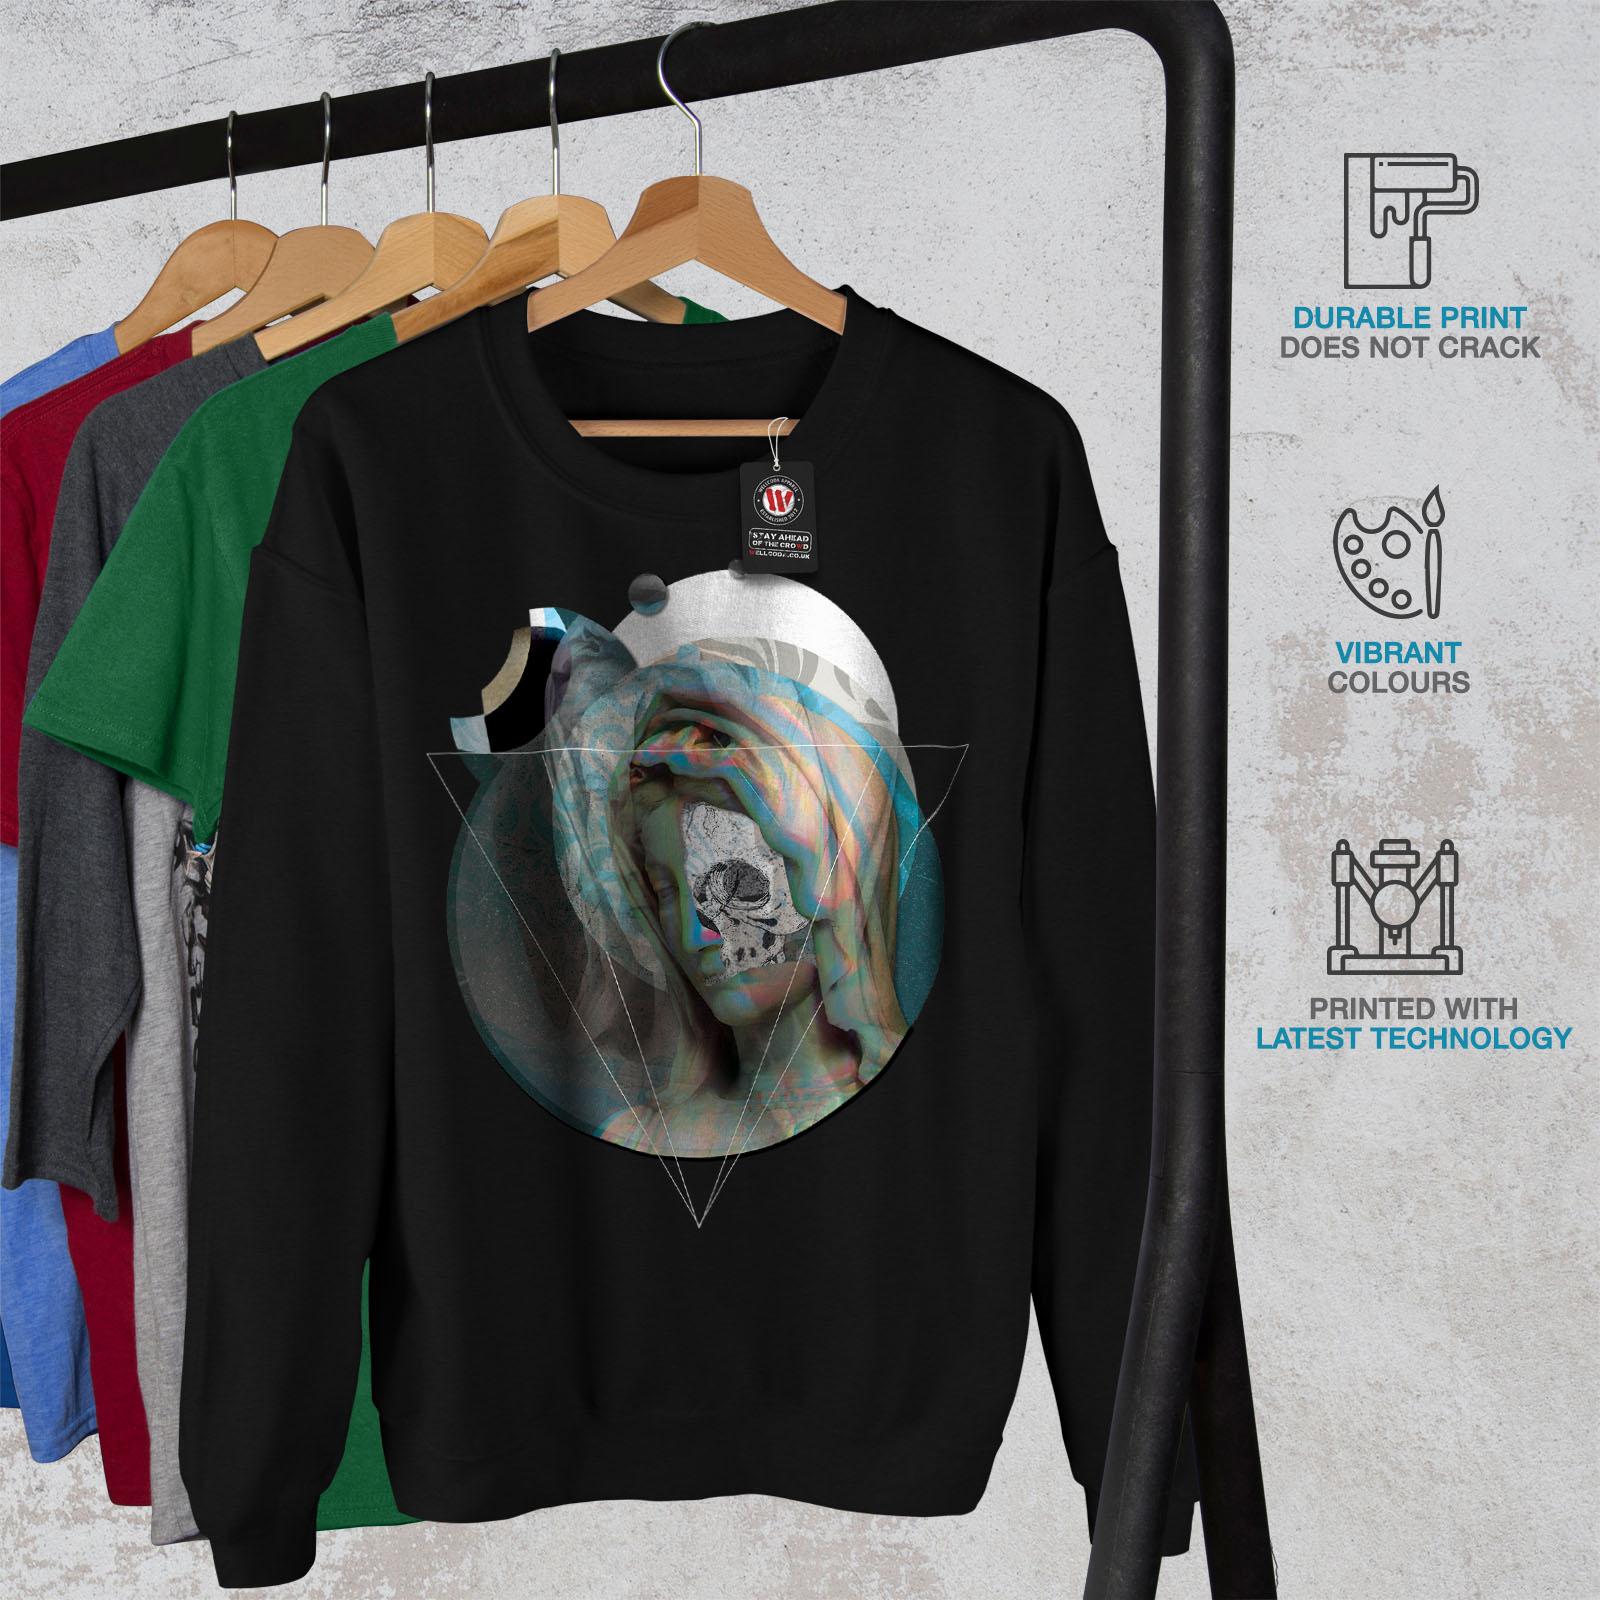 Wellcoda nero pullover fantastico Mystic Arts Sweatshirt maglione Skull casual Mens AwrTqxAn